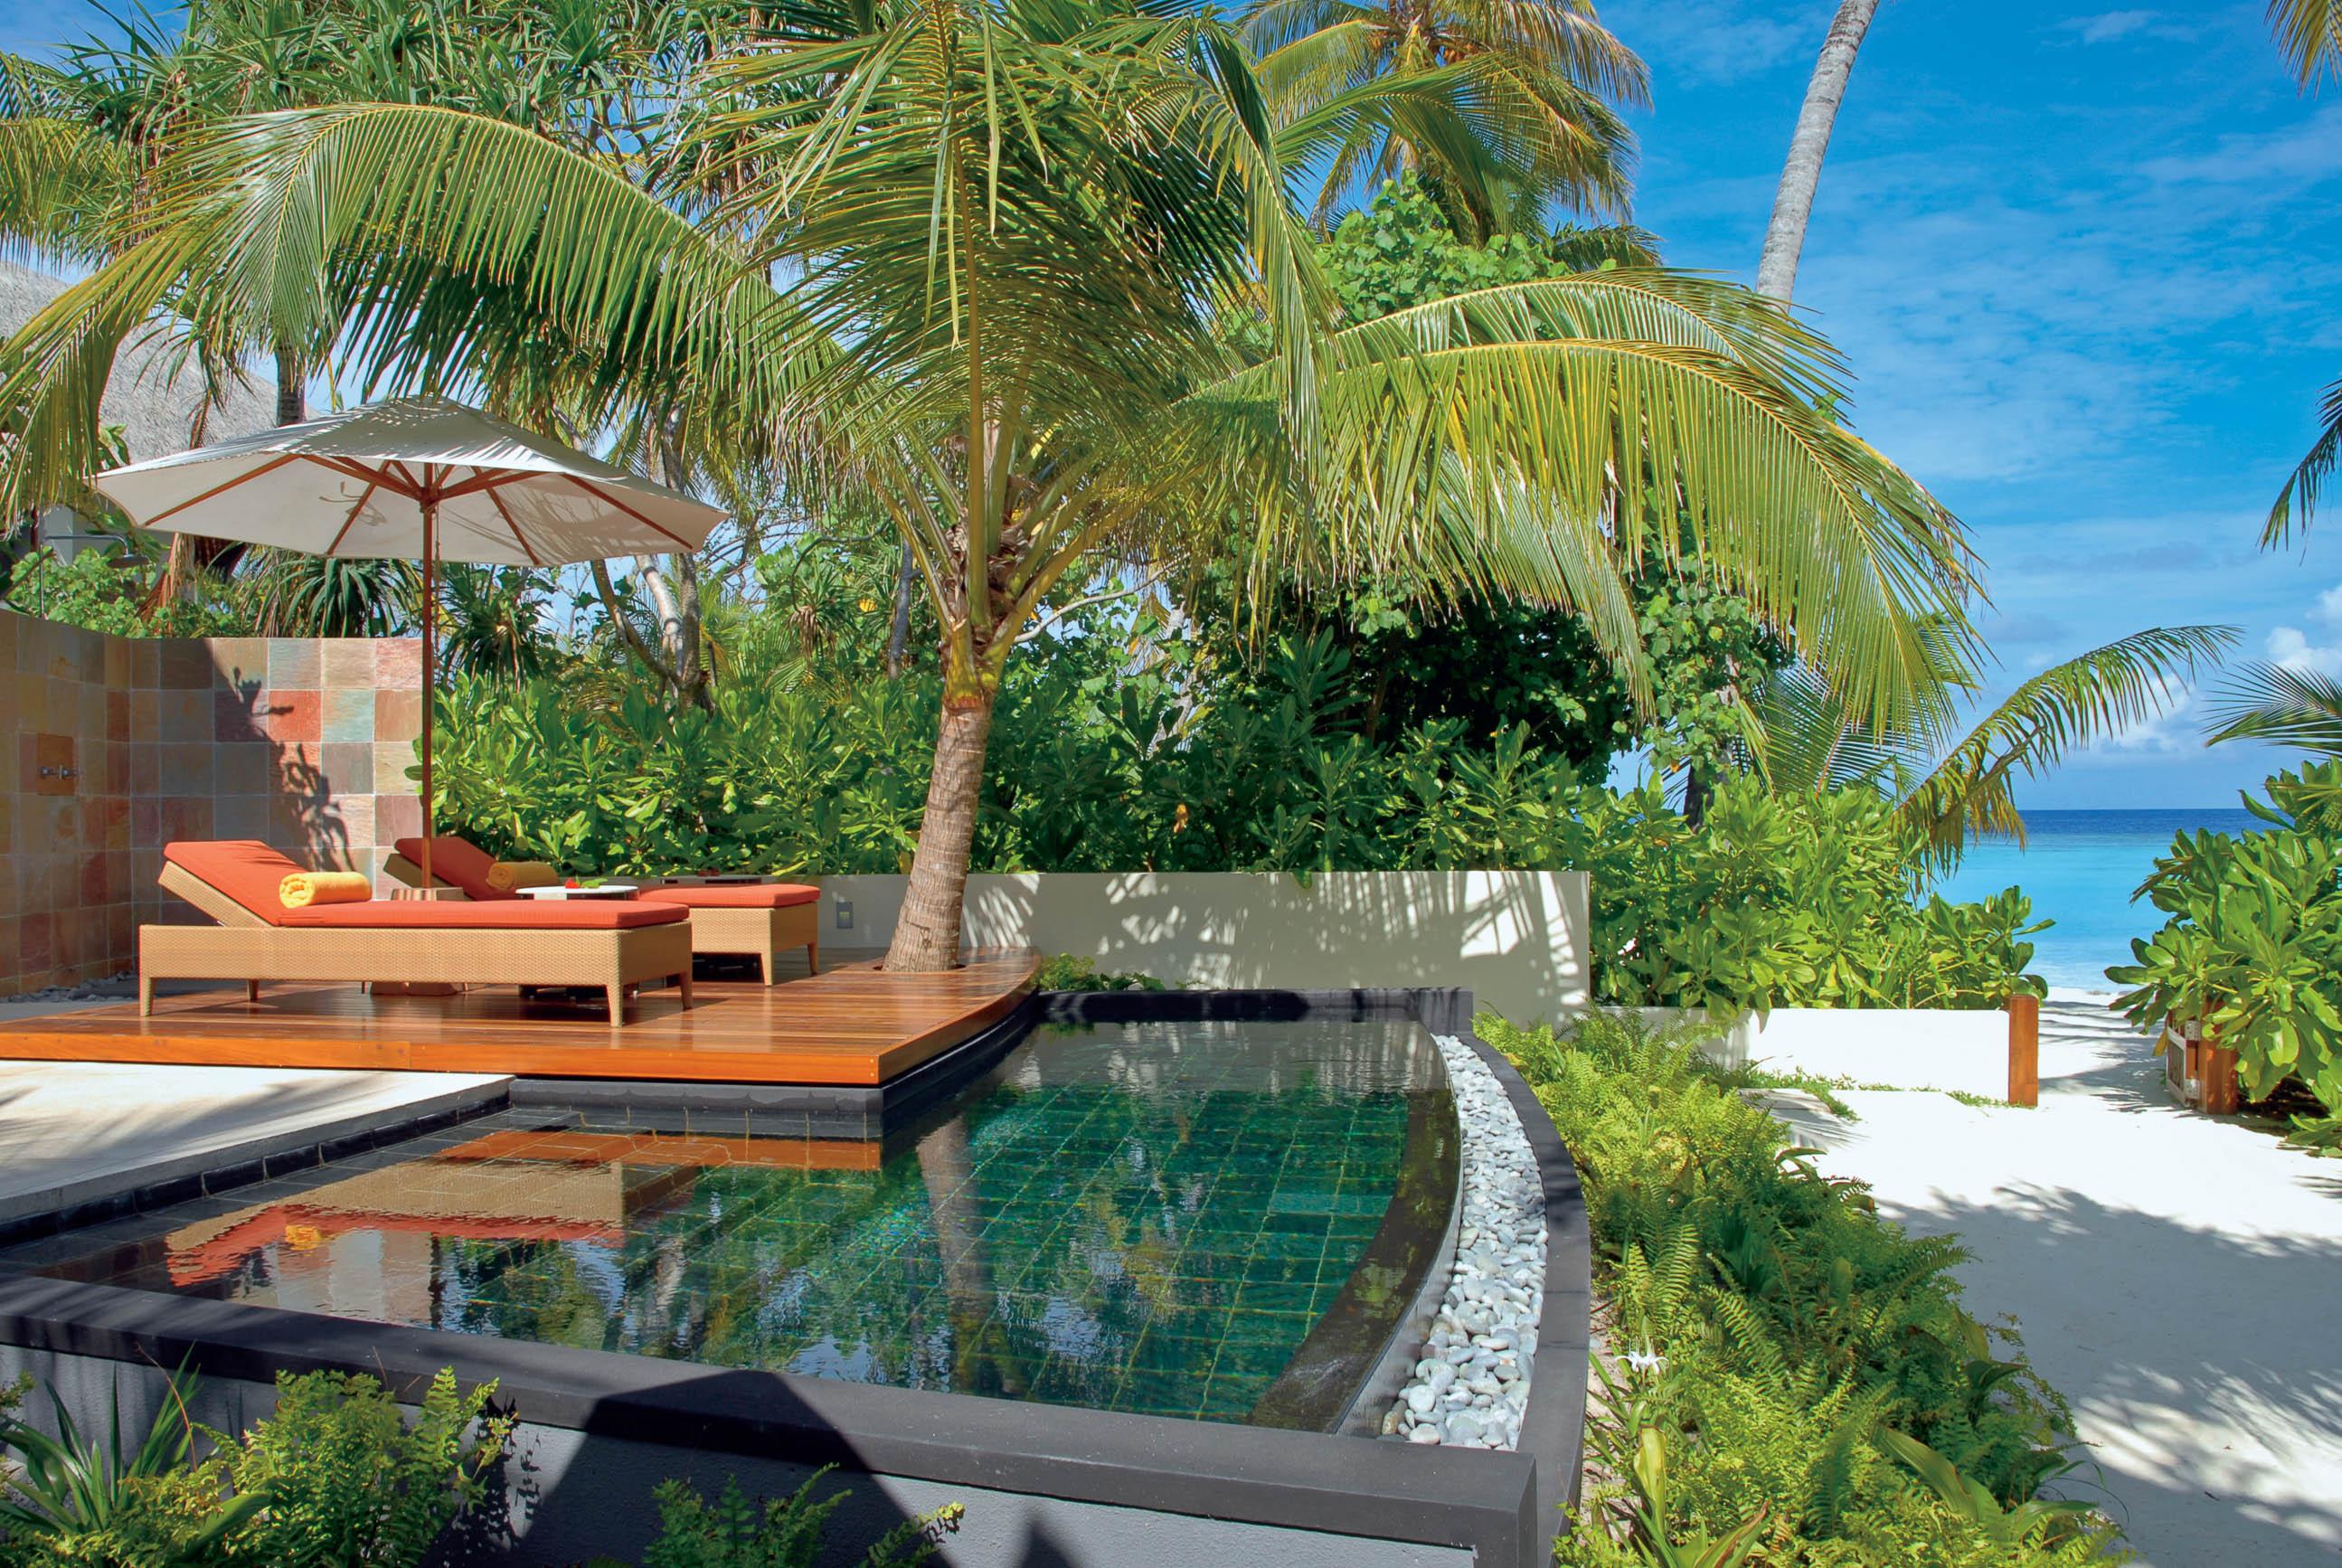 https://bubo.sk/uploads/galleries/16372/halaveli-maldives-beach-villa-2_hd-15.jpg